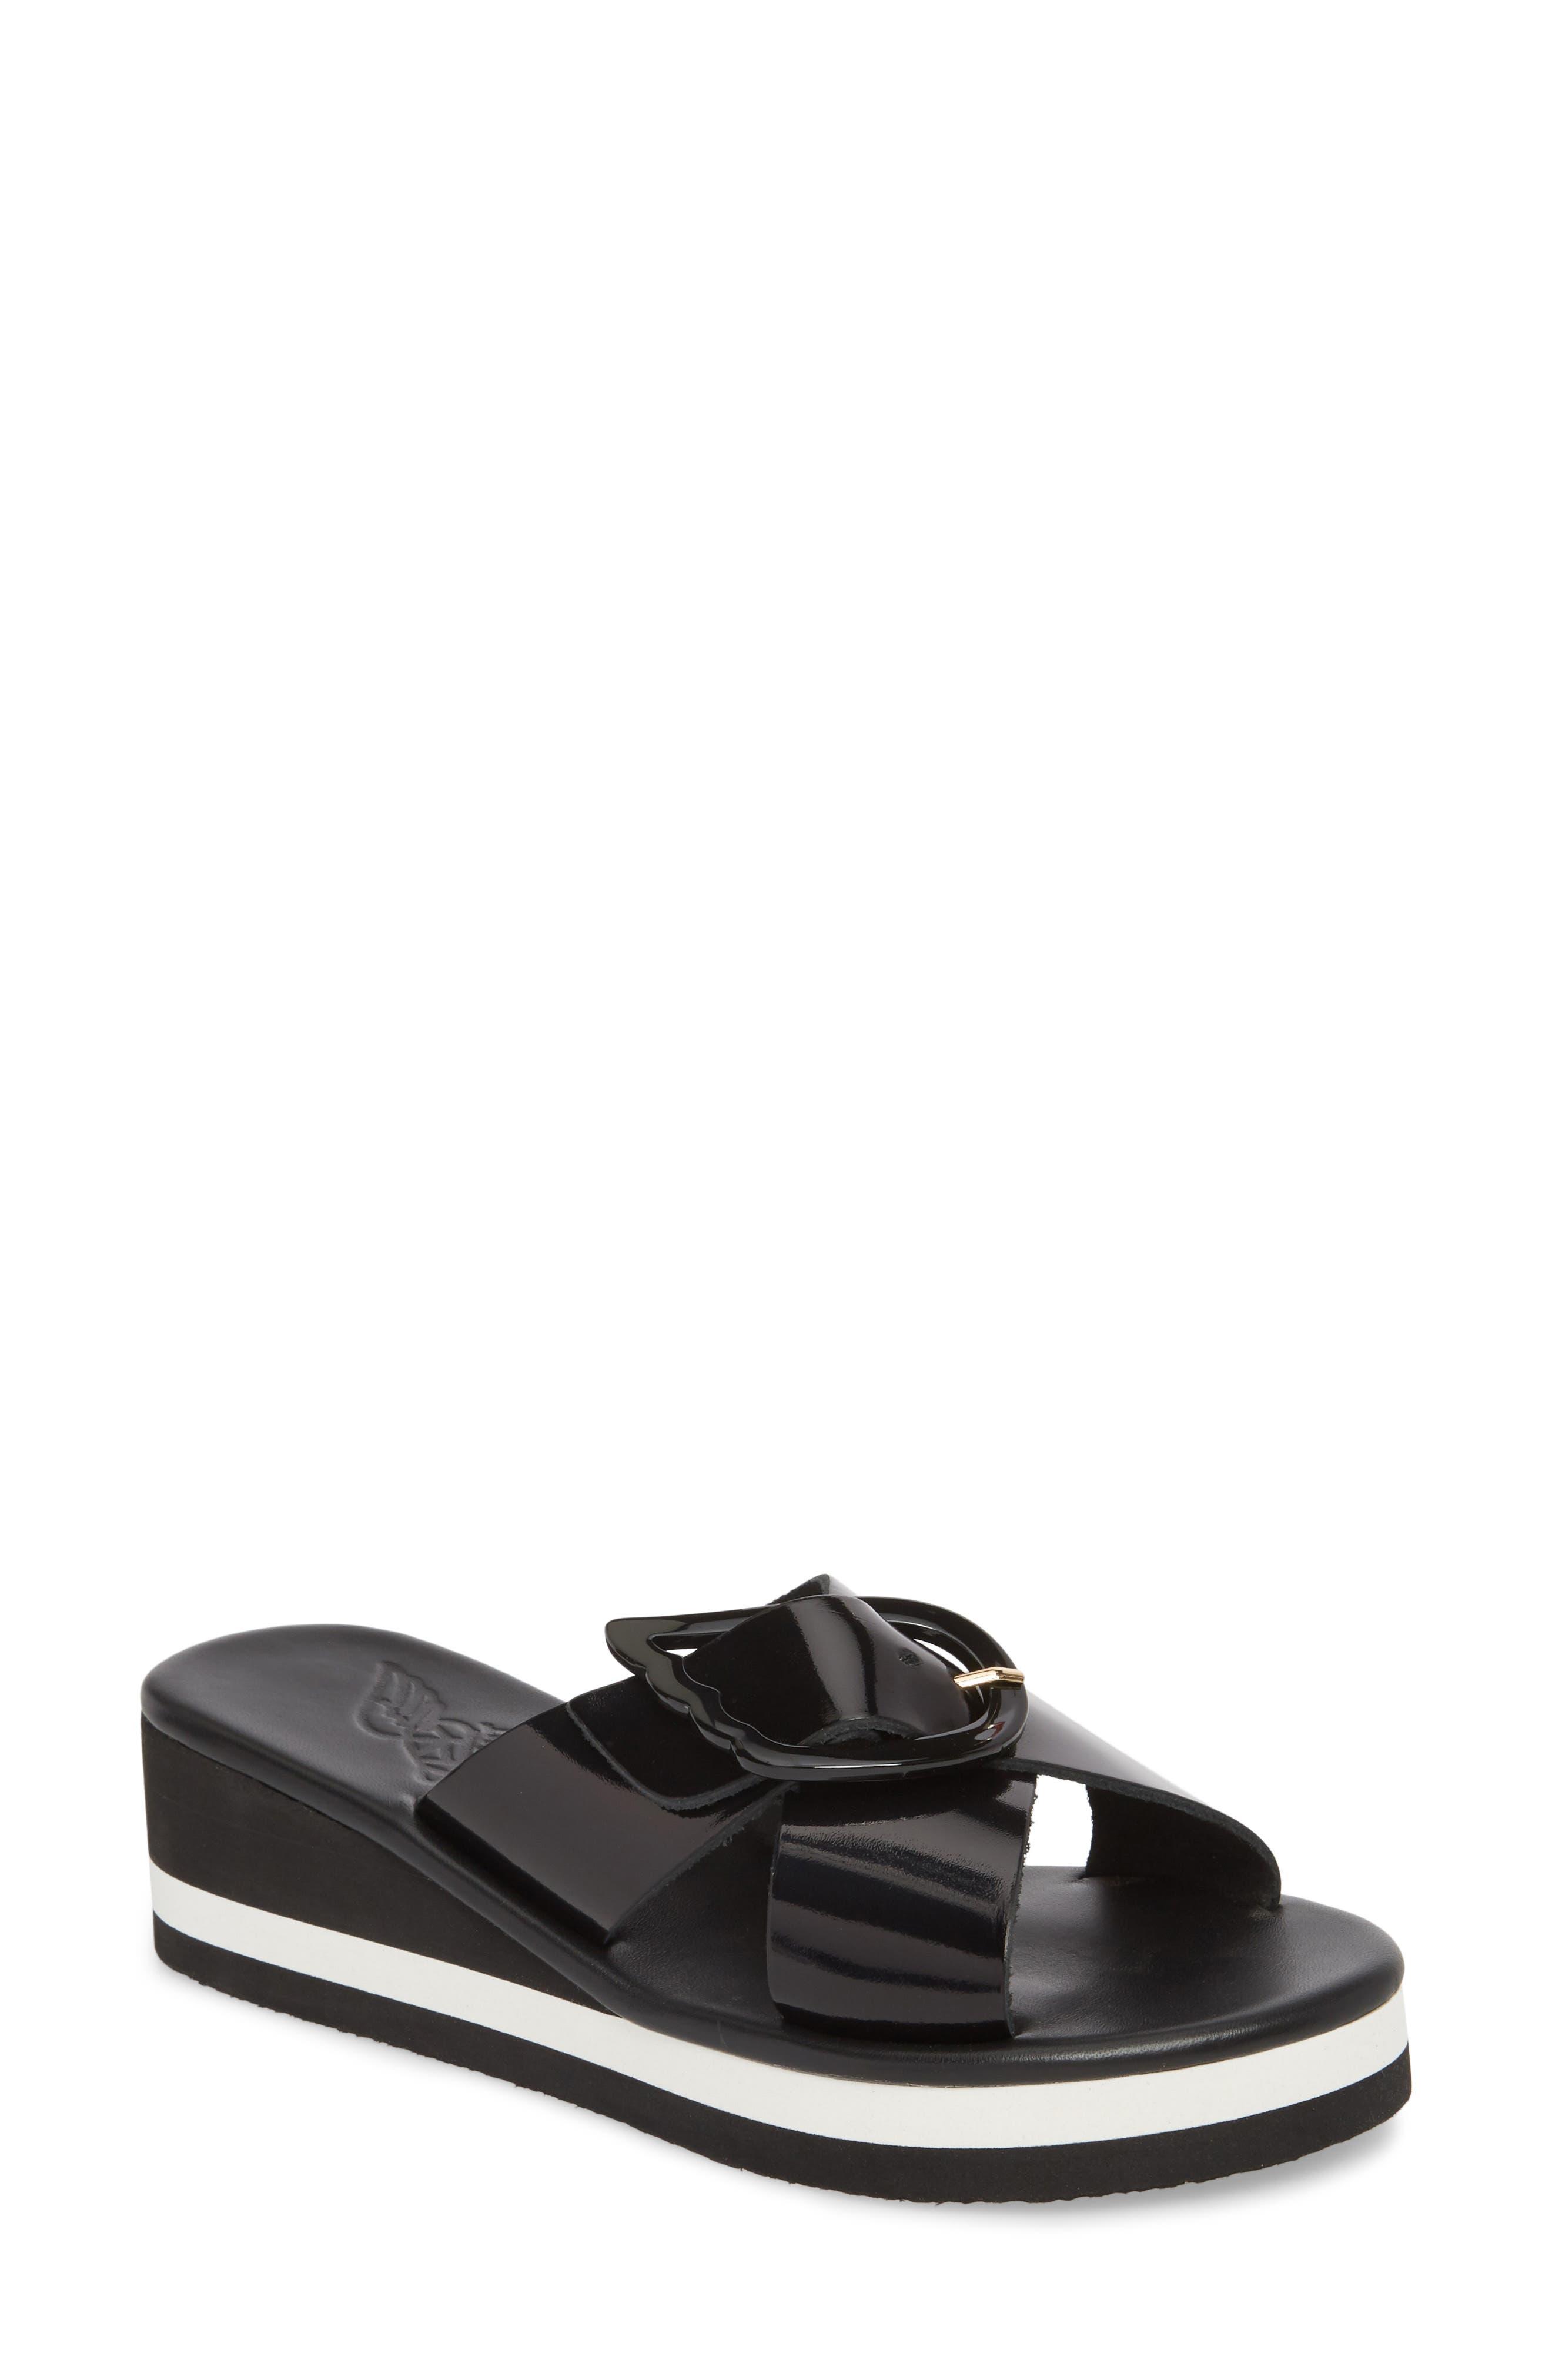 Thais Wedge Slide Sandal,                         Main,                         color, Black